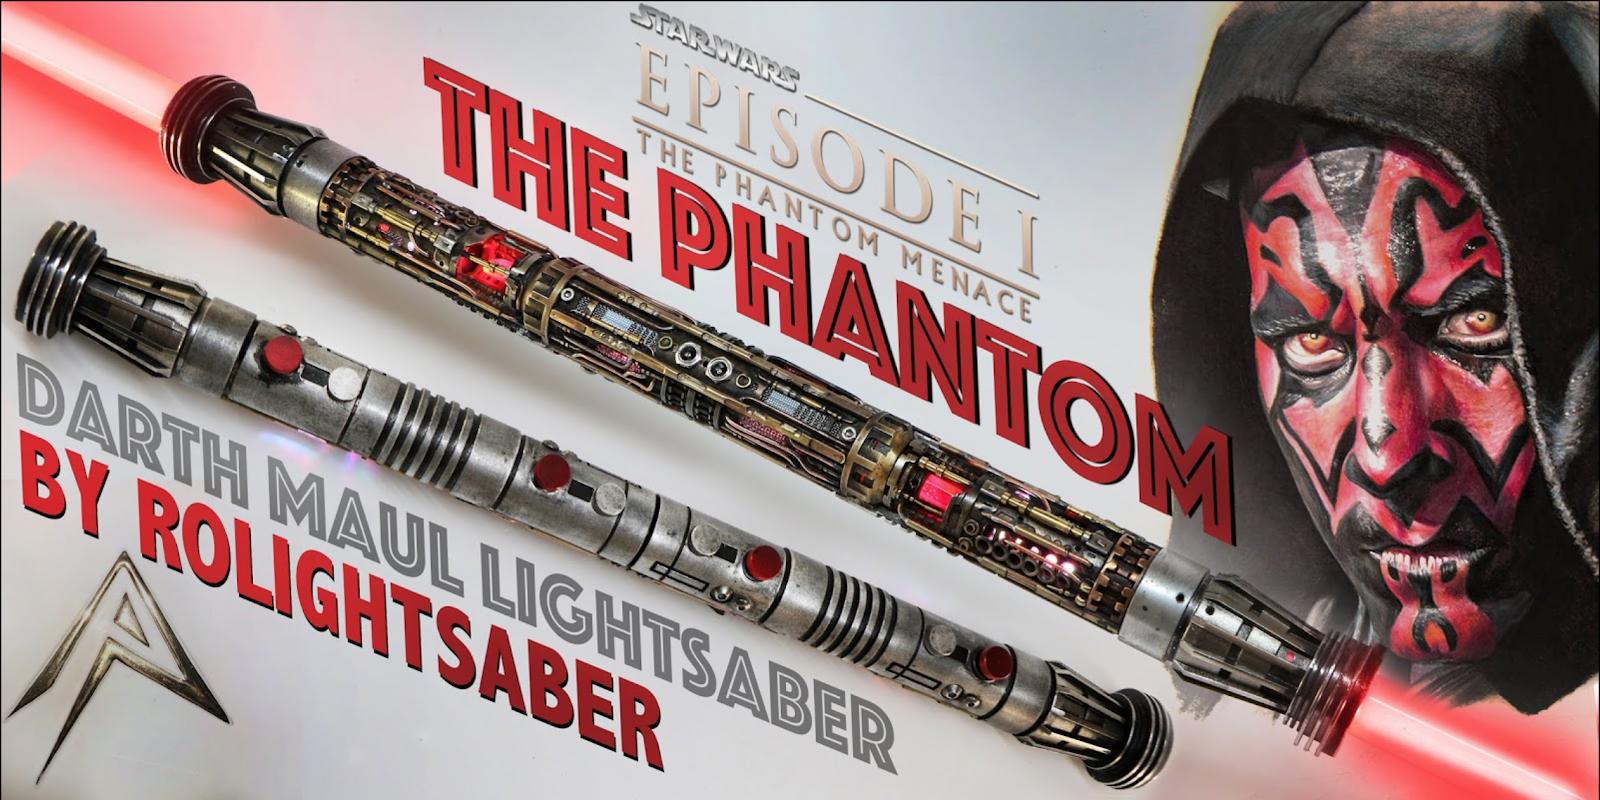 The Phantom: Darth Maul Lightsaber